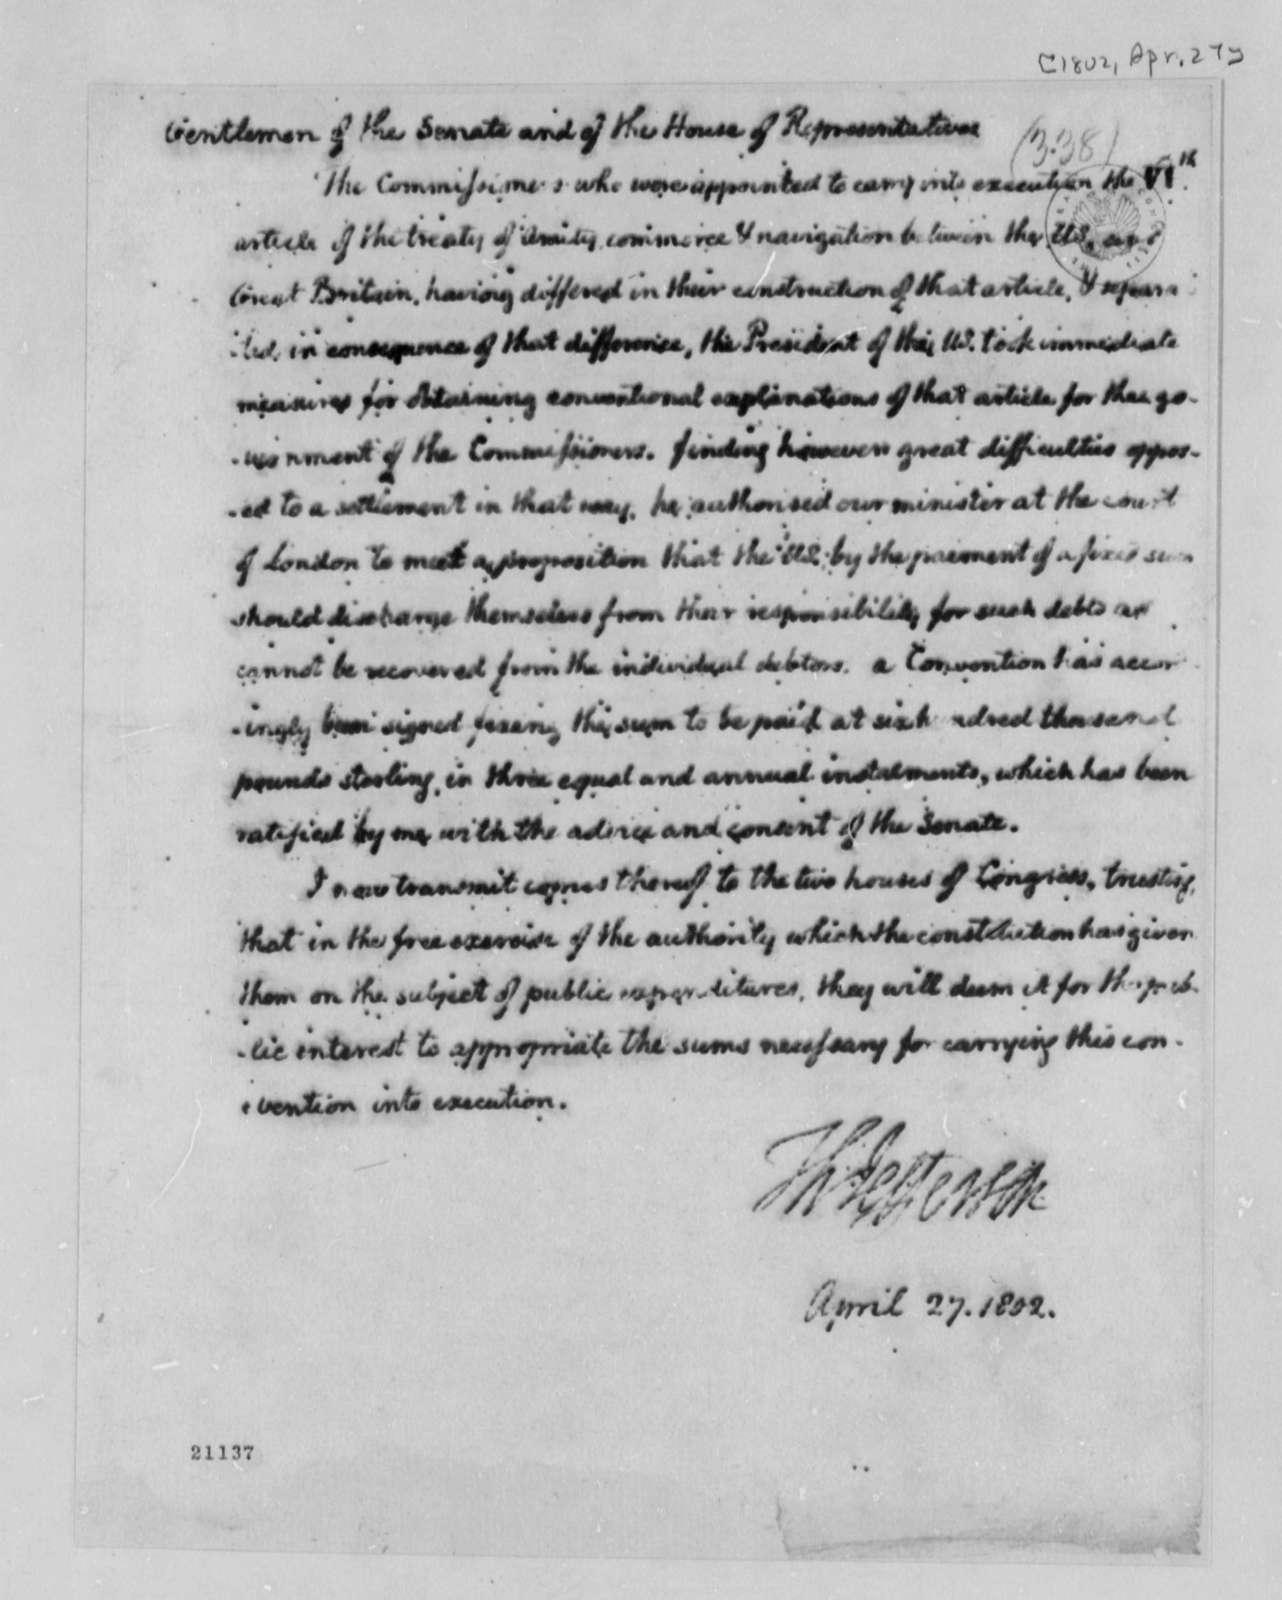 Thomas Jefferson to Congress, April 27, 1802